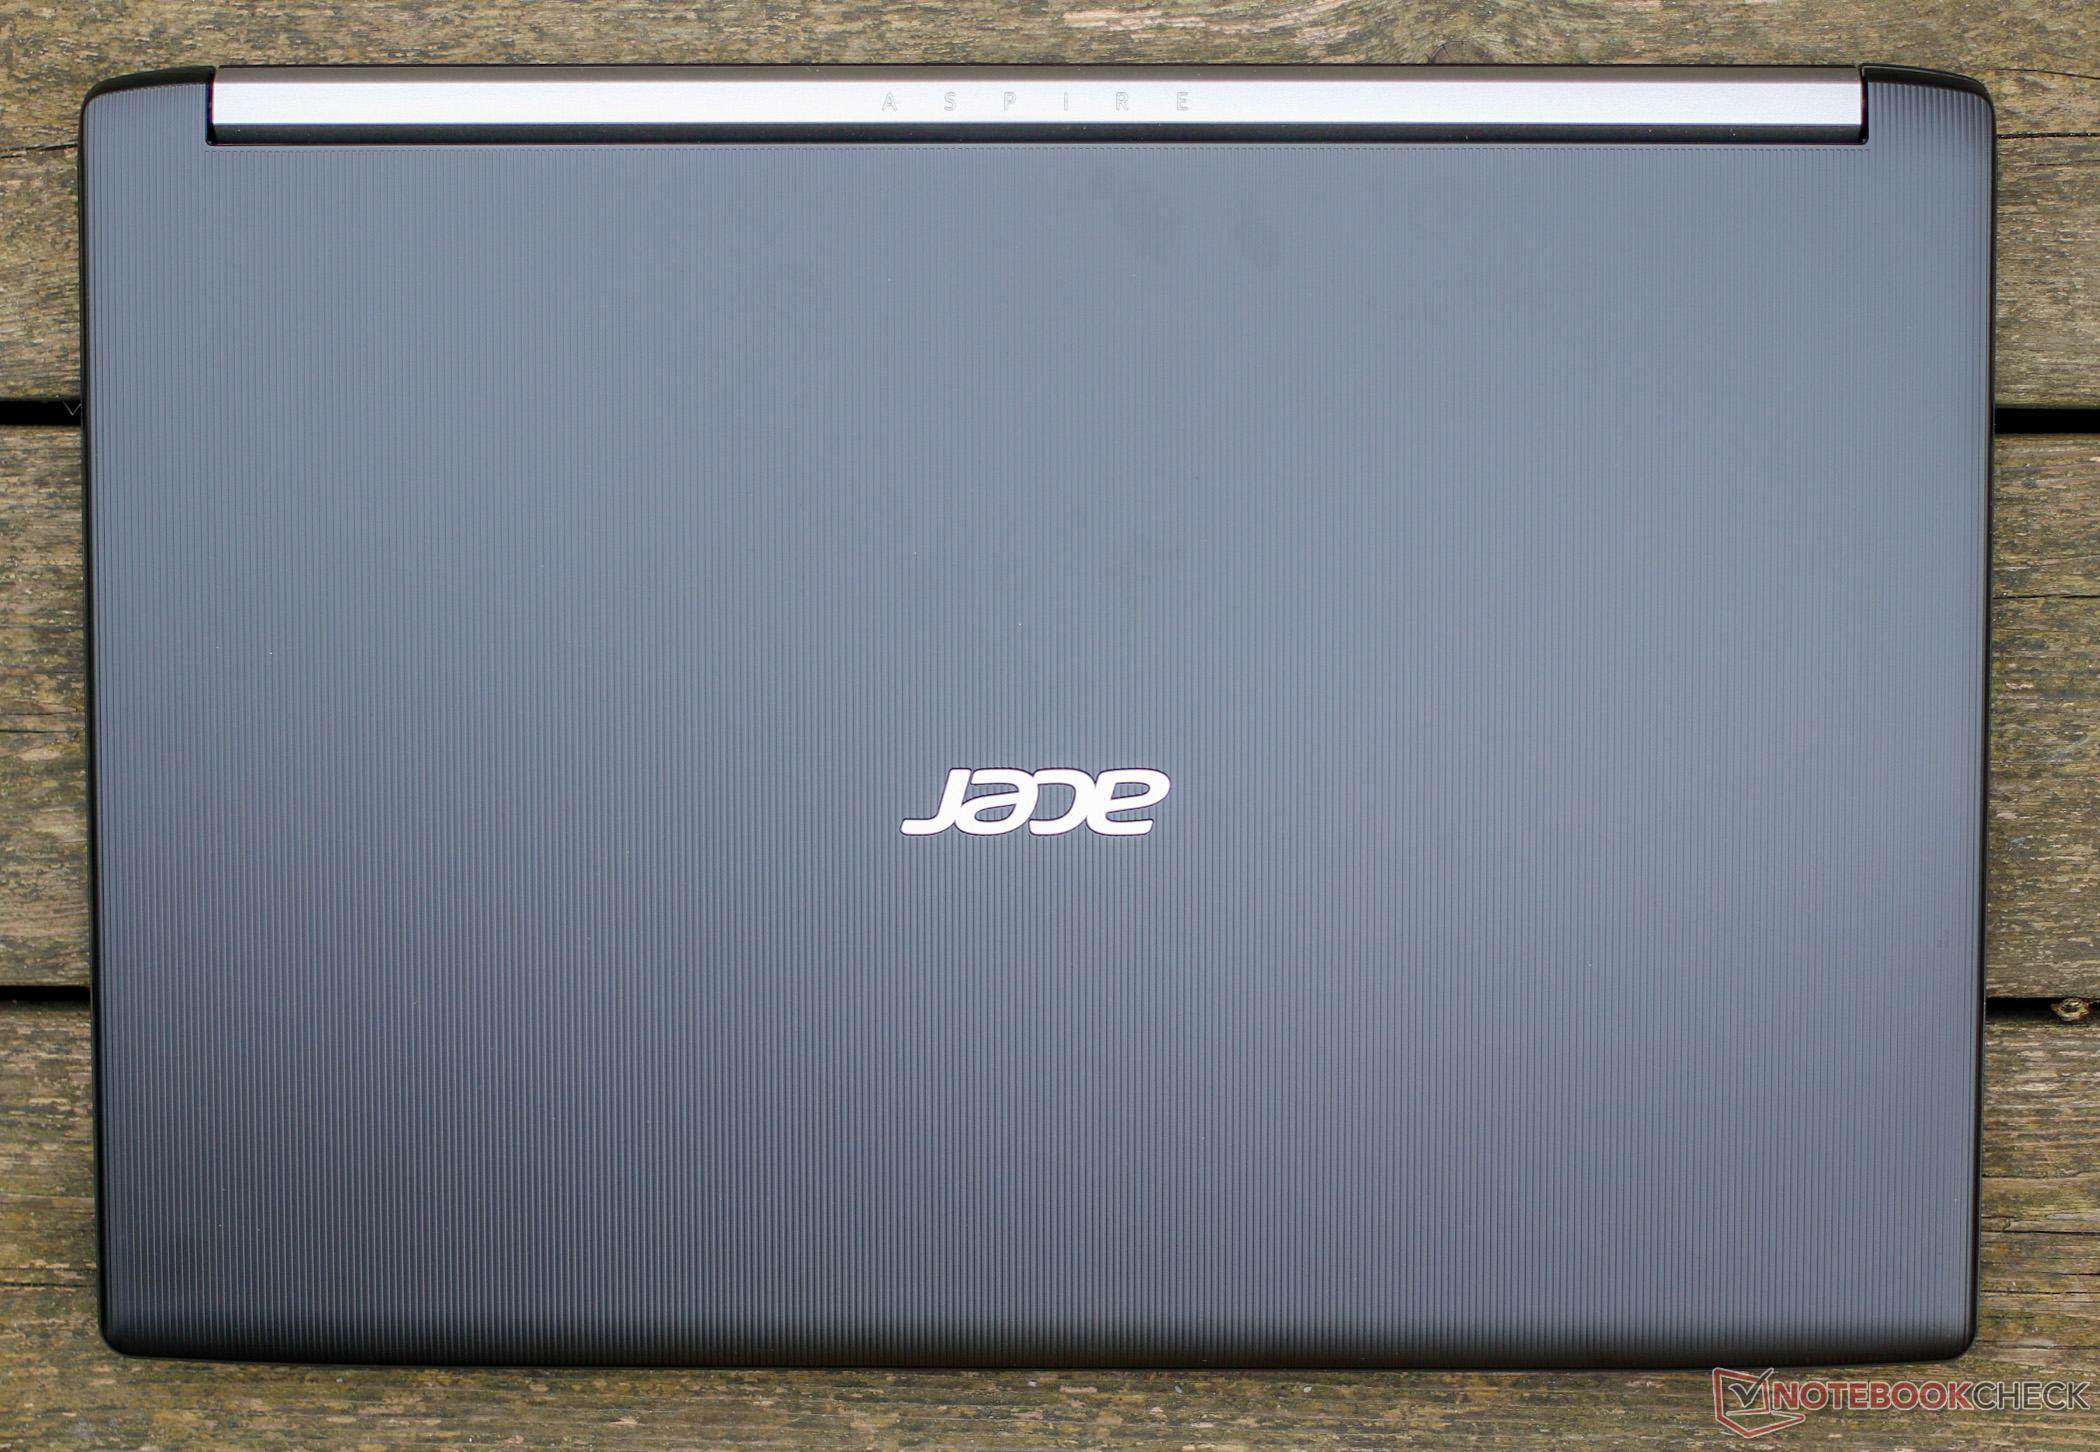 Acer Aspire 5 A515-51G-509A (8250U, MX130, FHD) Laptop